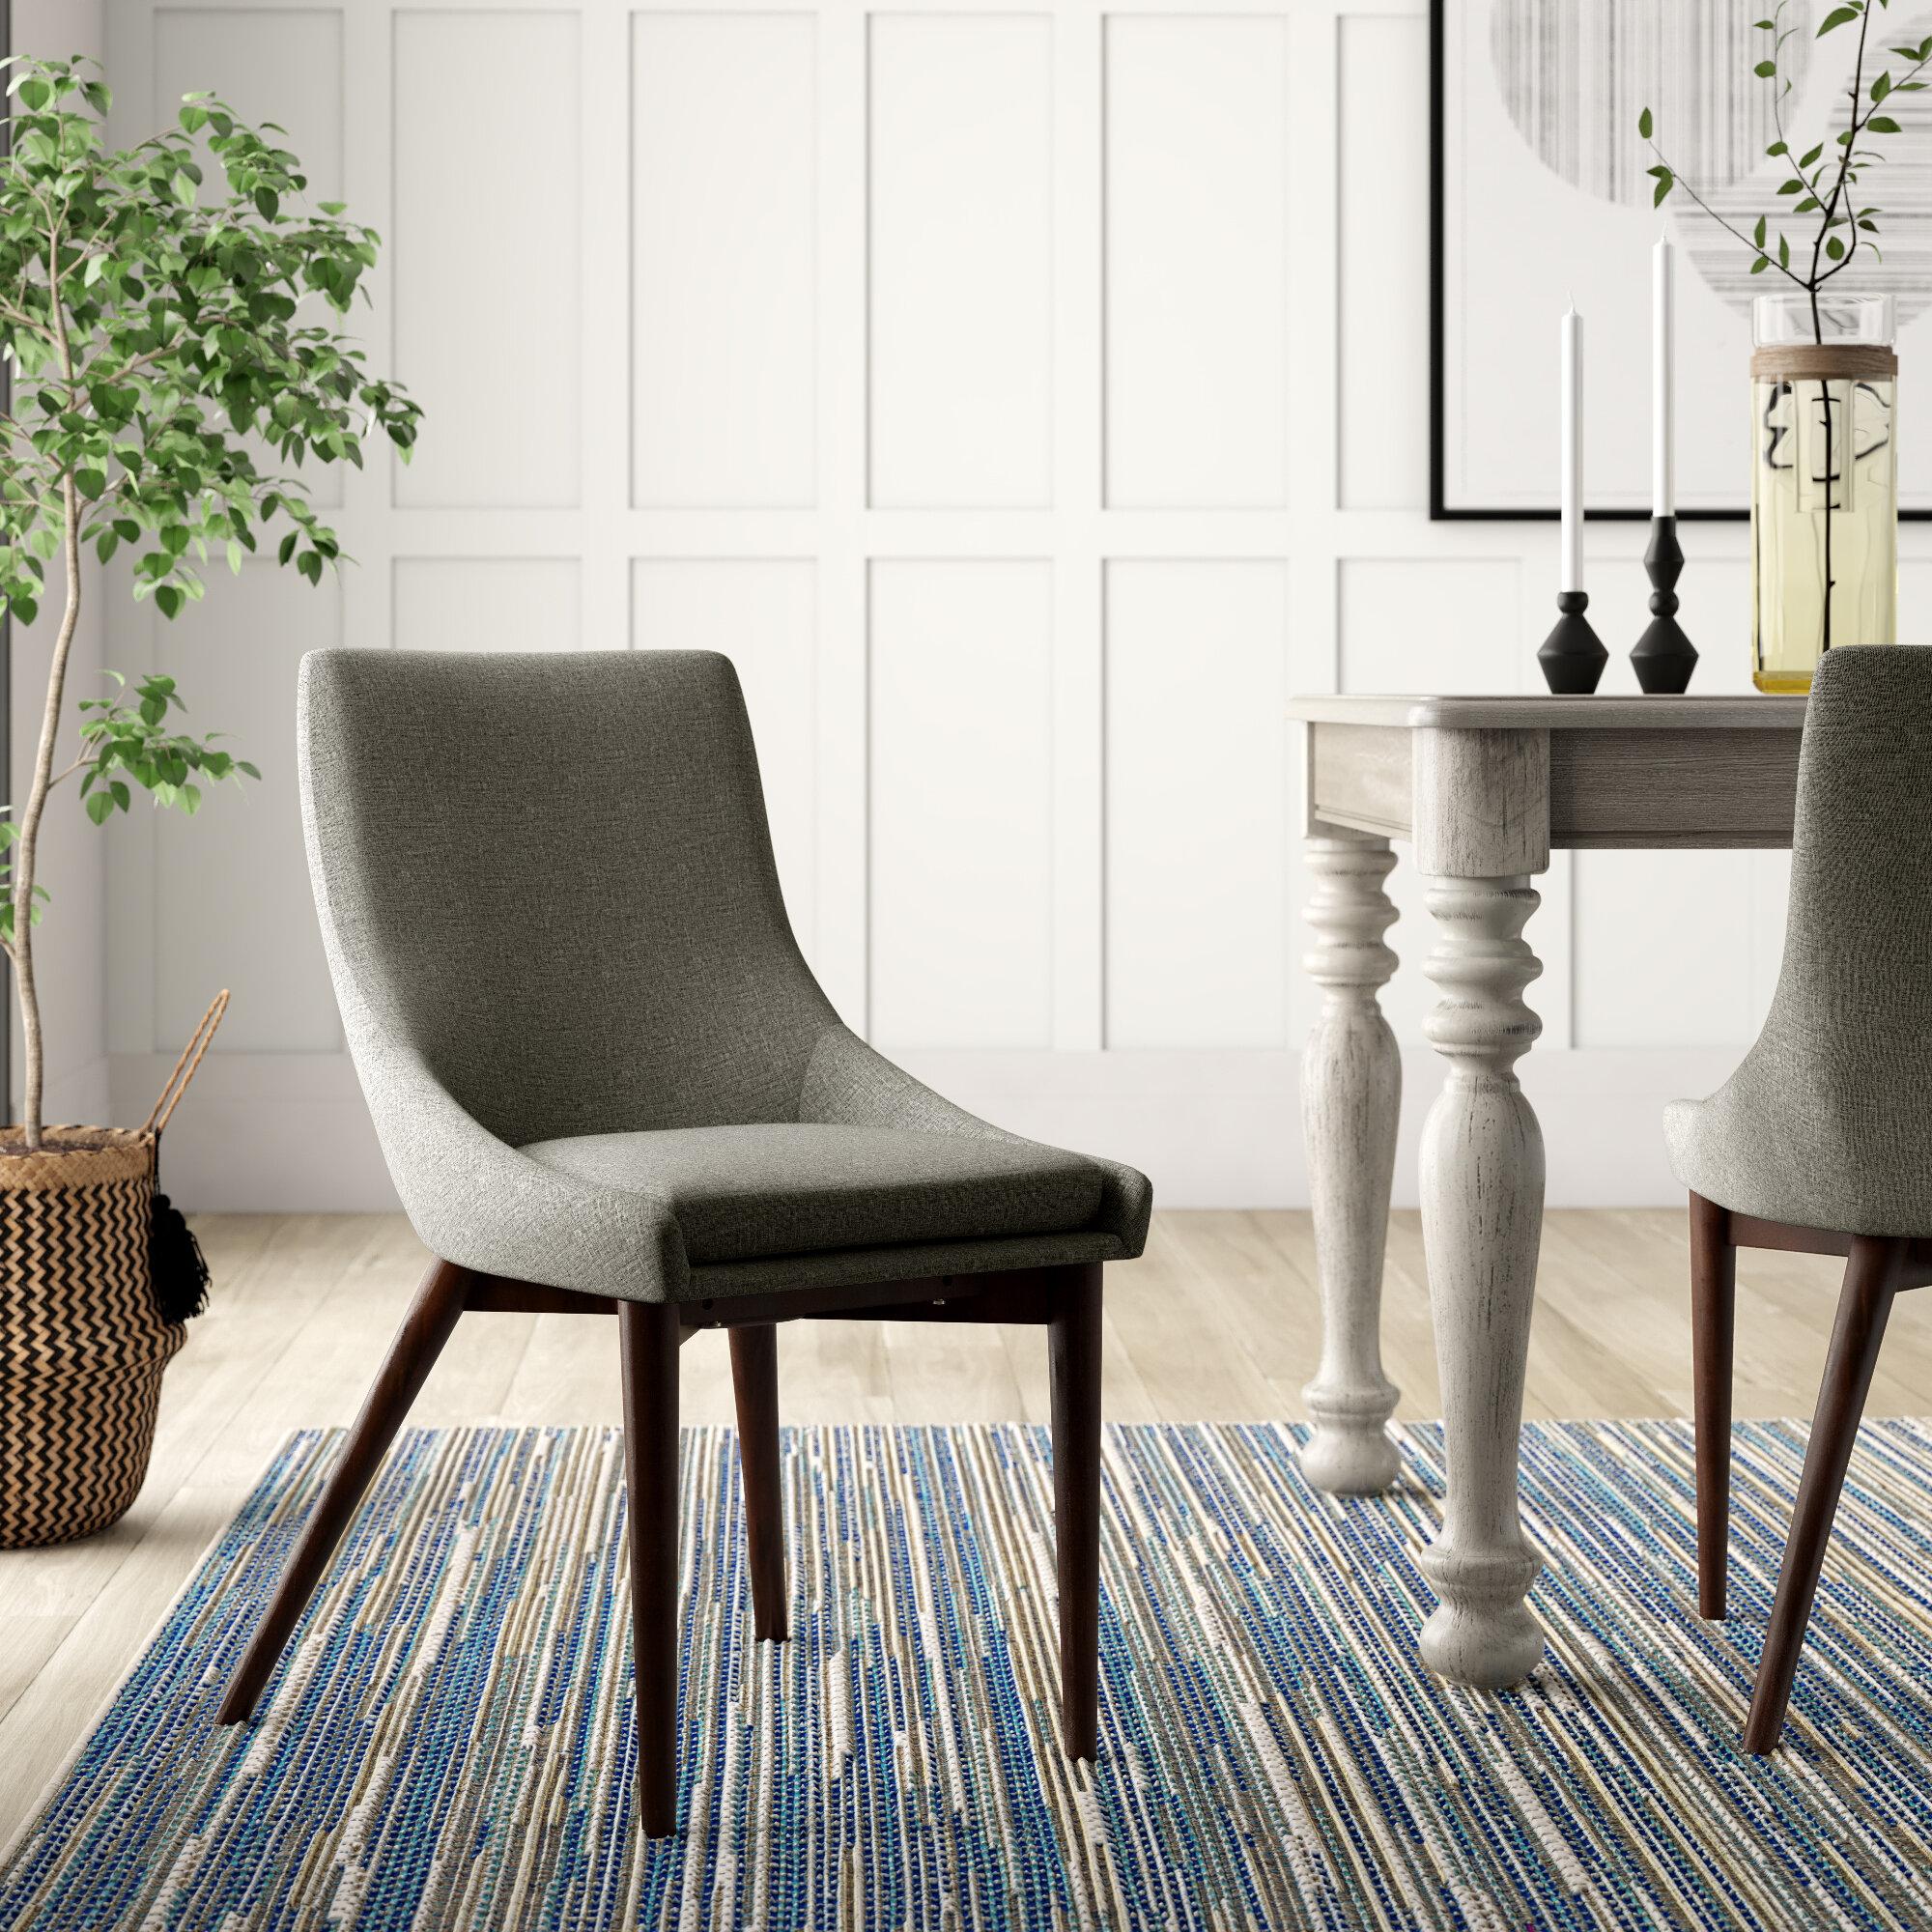 Casandra Upholstered Side Chair In Gray Reviews Joss Main